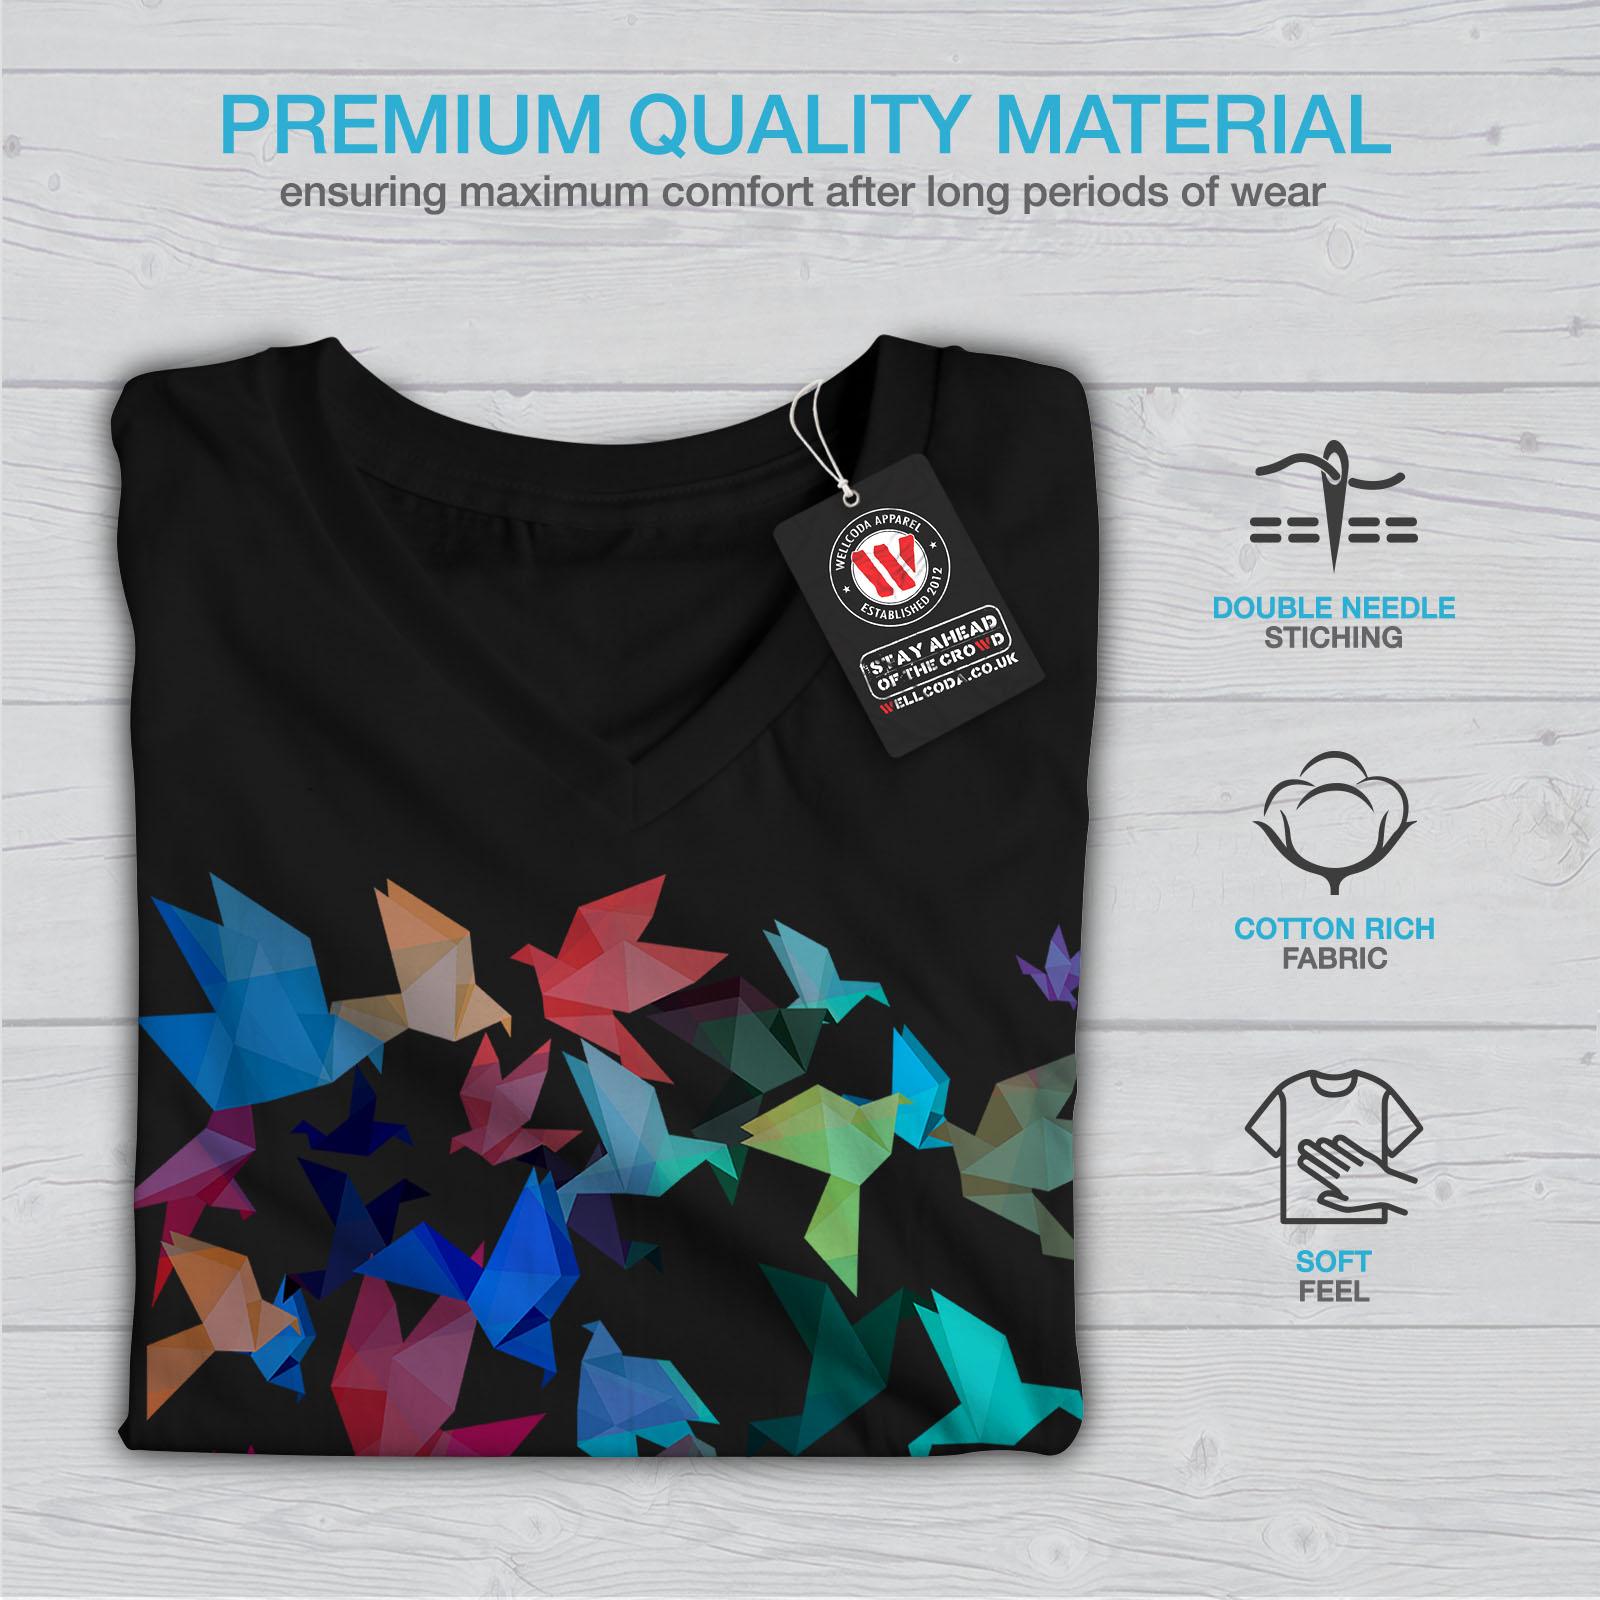 Wellcoda-Origami-Bird-Colors-Womens-V-Neck-T-shirt-Craft-Graphic-Design-Tee thumbnail 5